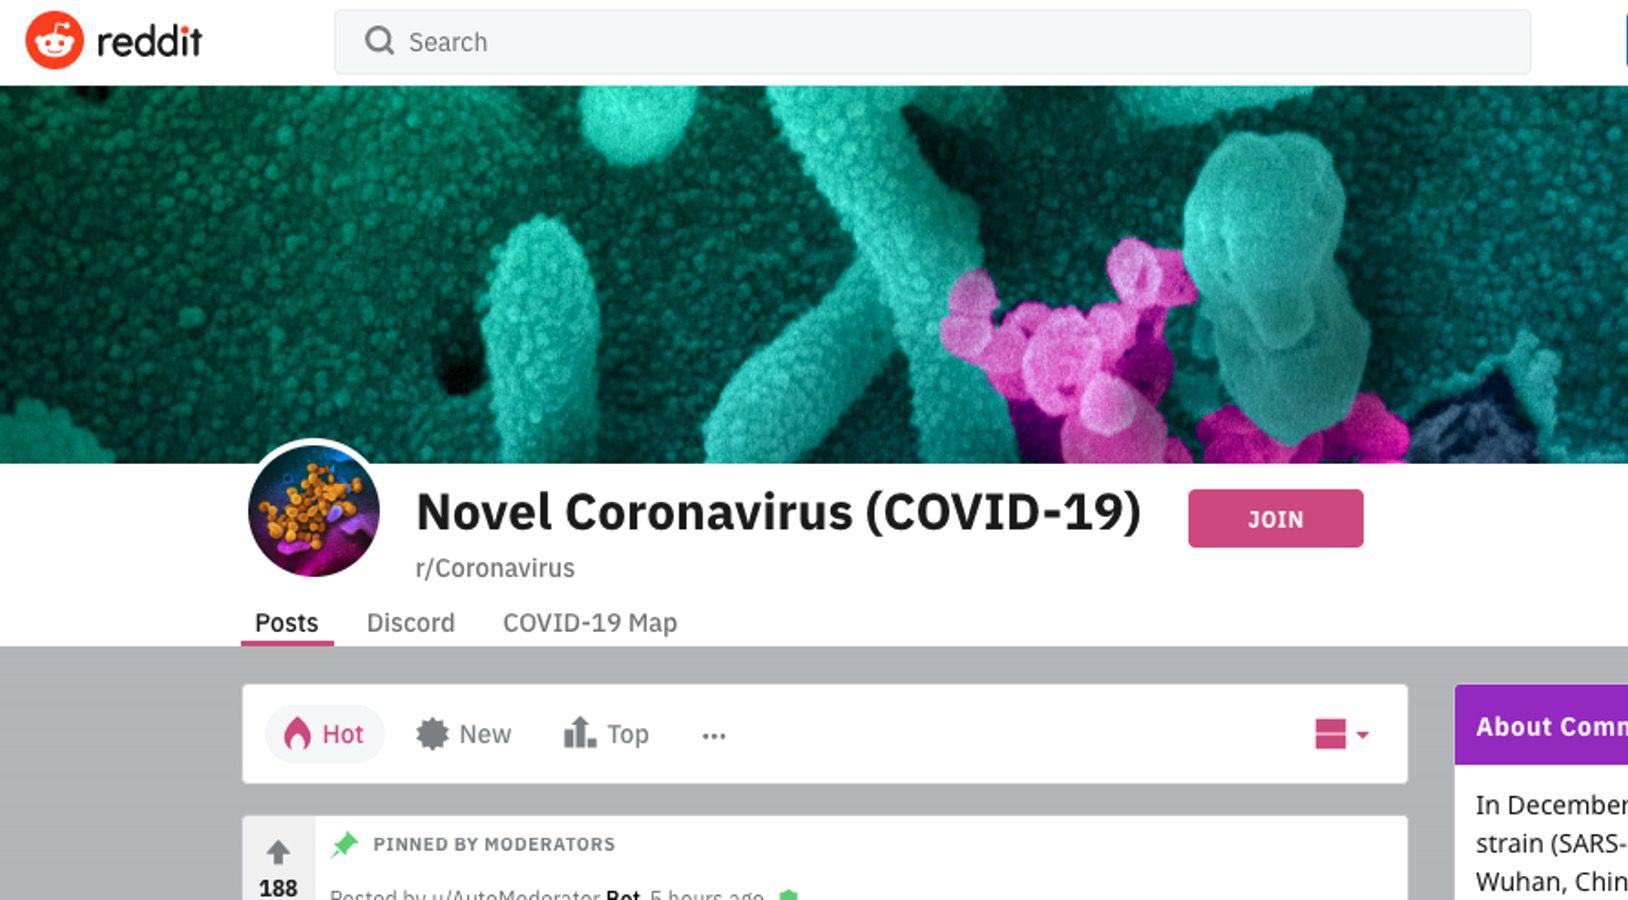 reddit /r/coronavirus